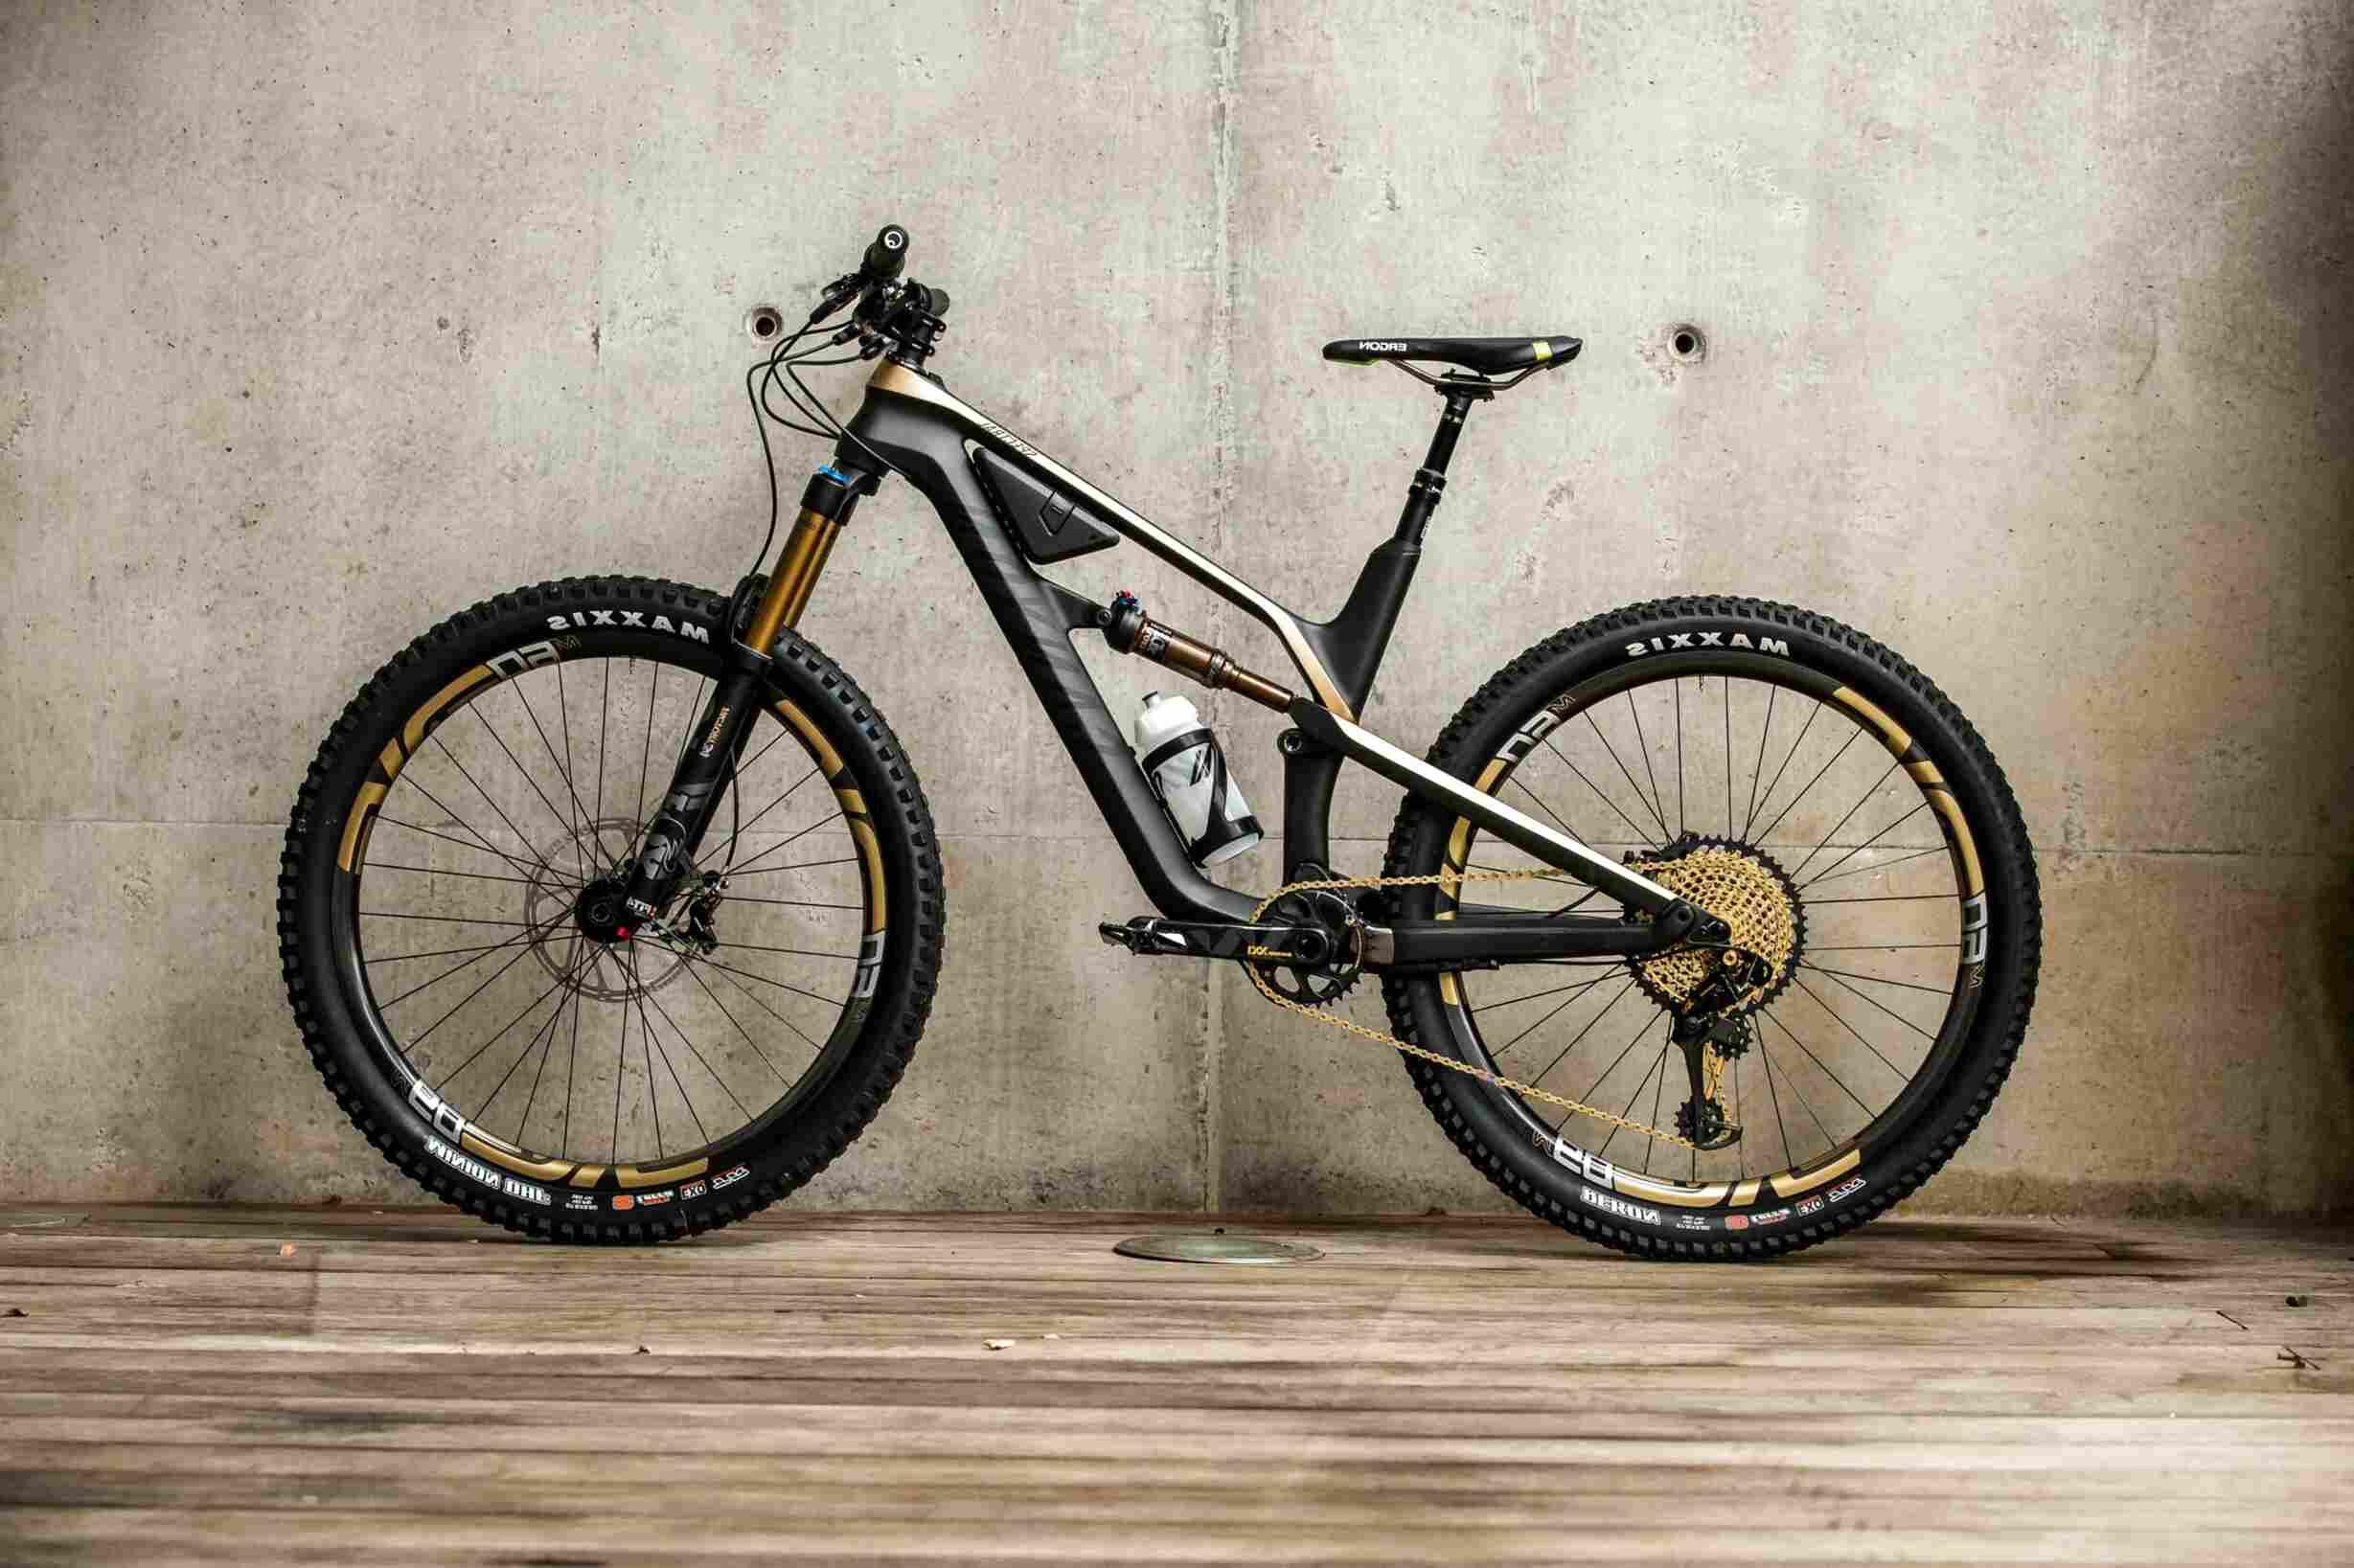 canyon mountain bike for sale